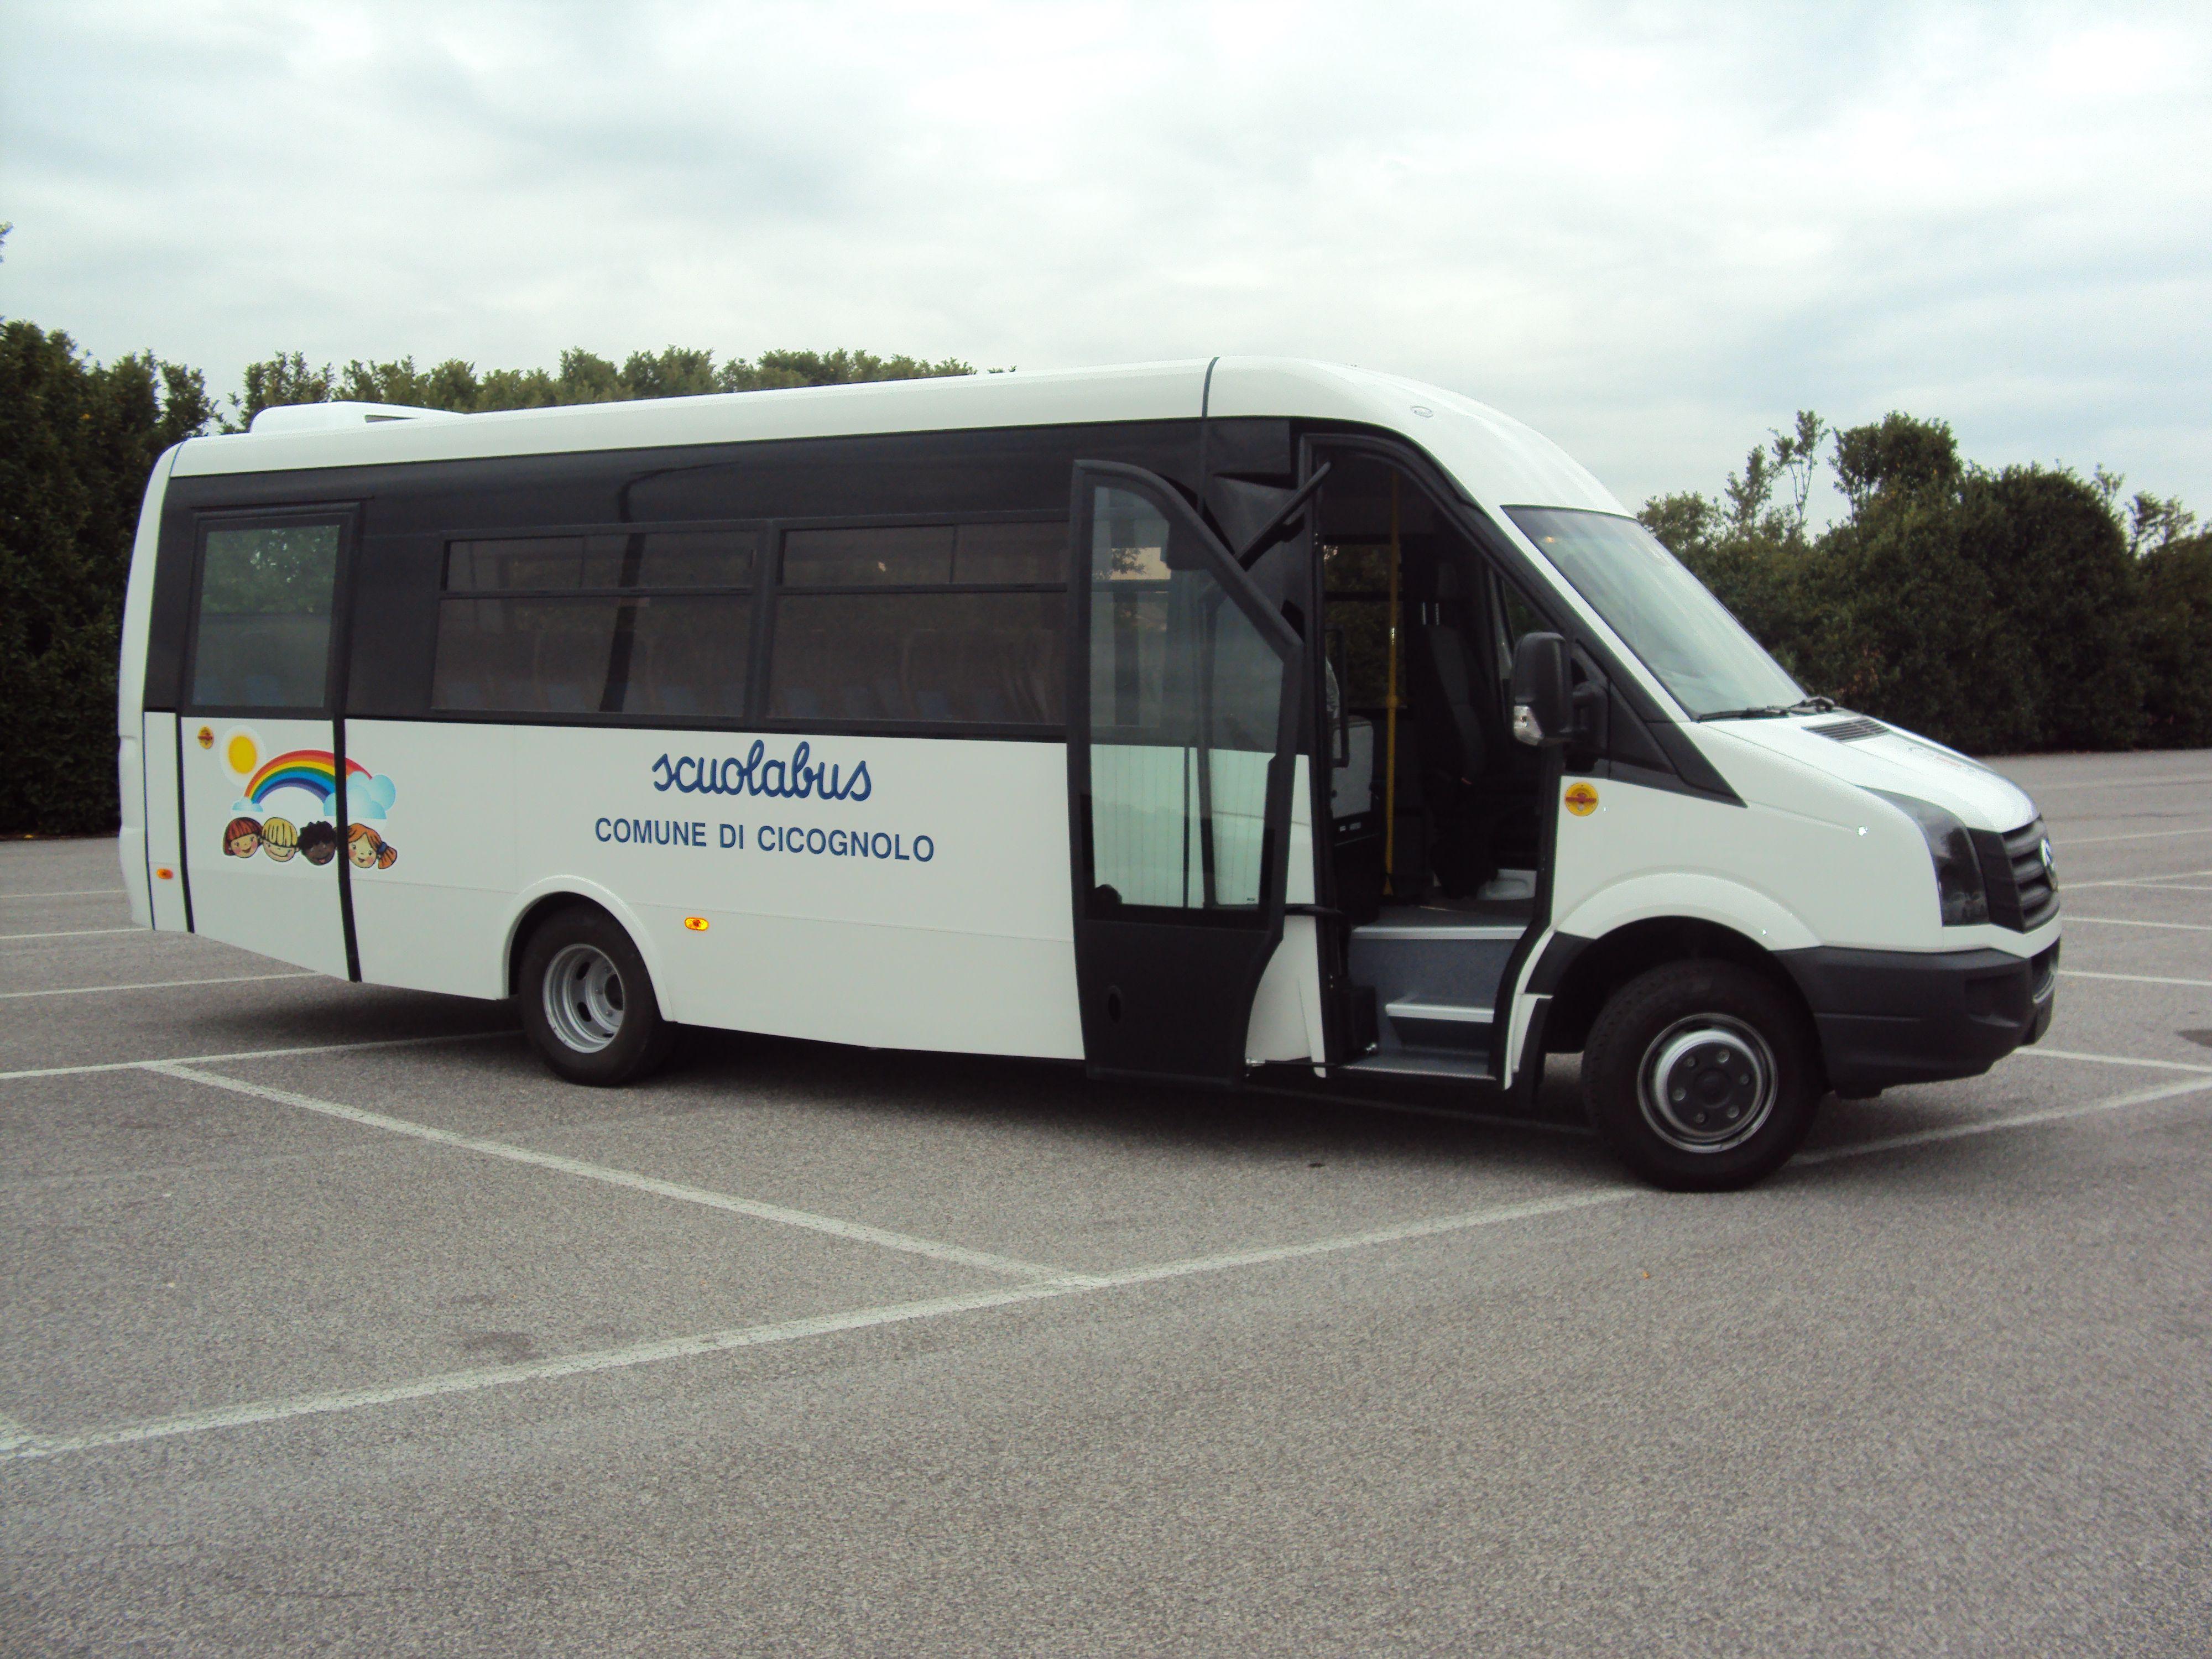 Un bus bianco vista laterale